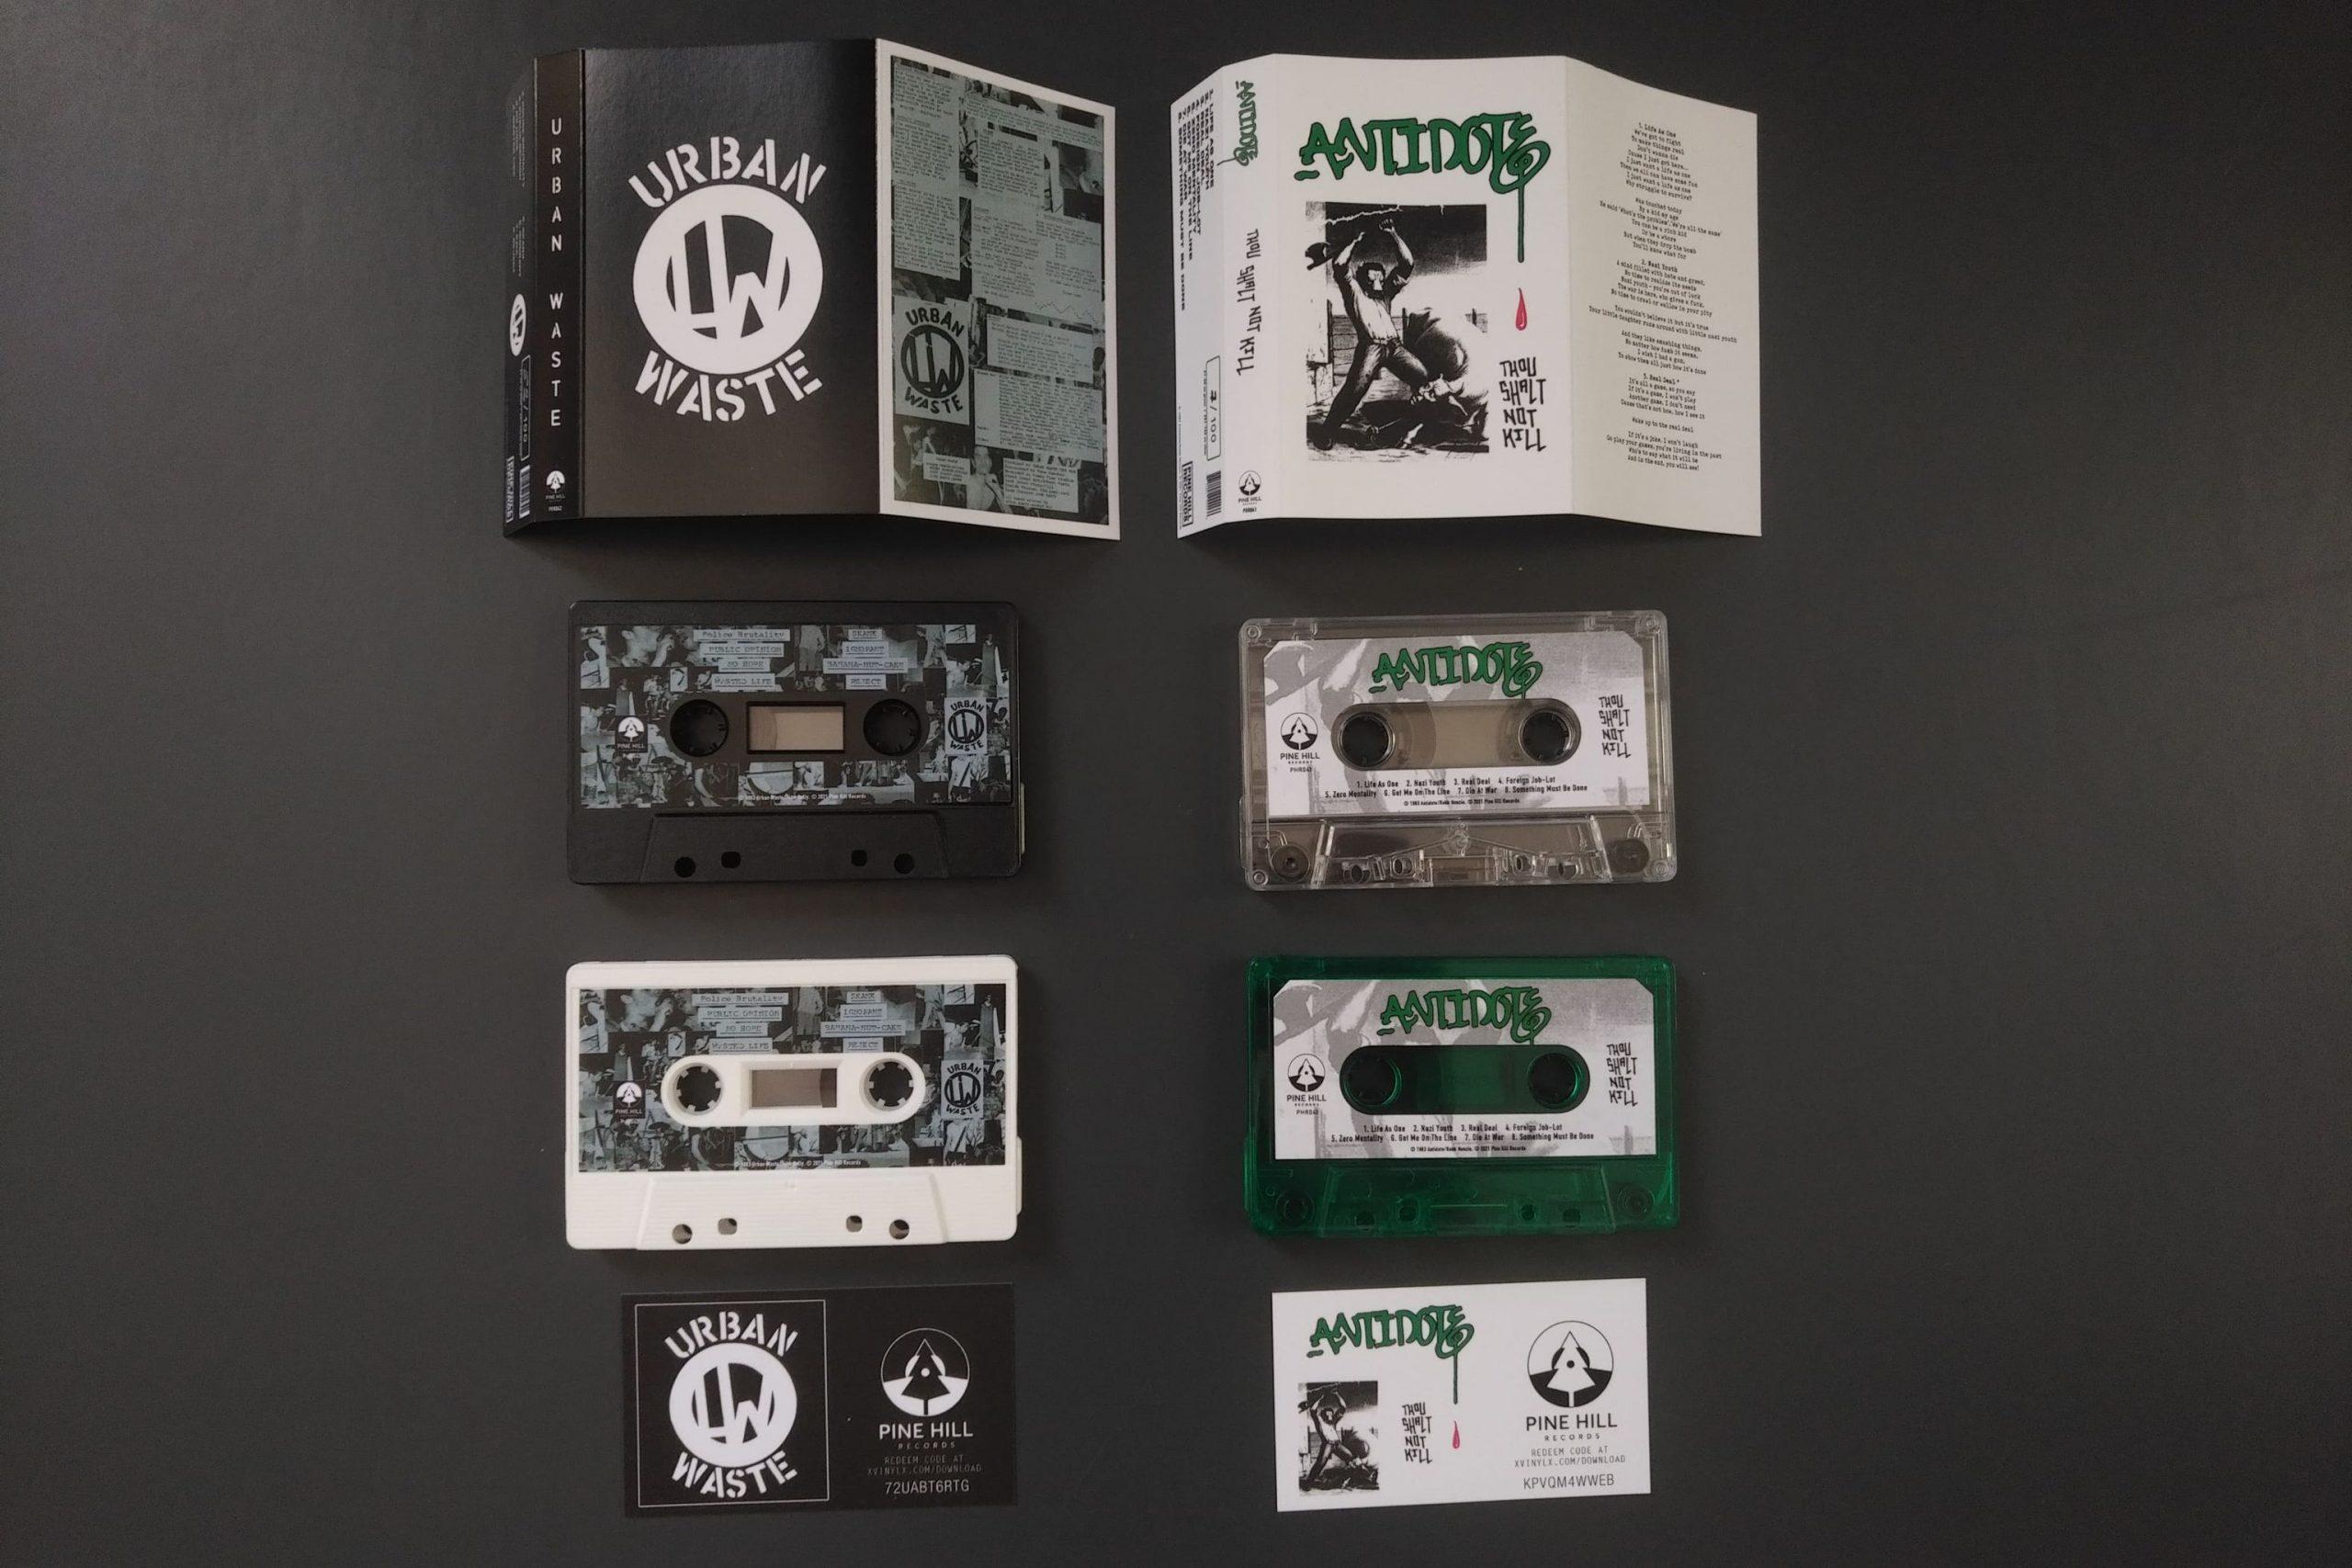 Urban Waste & Antidote - Tape reissue